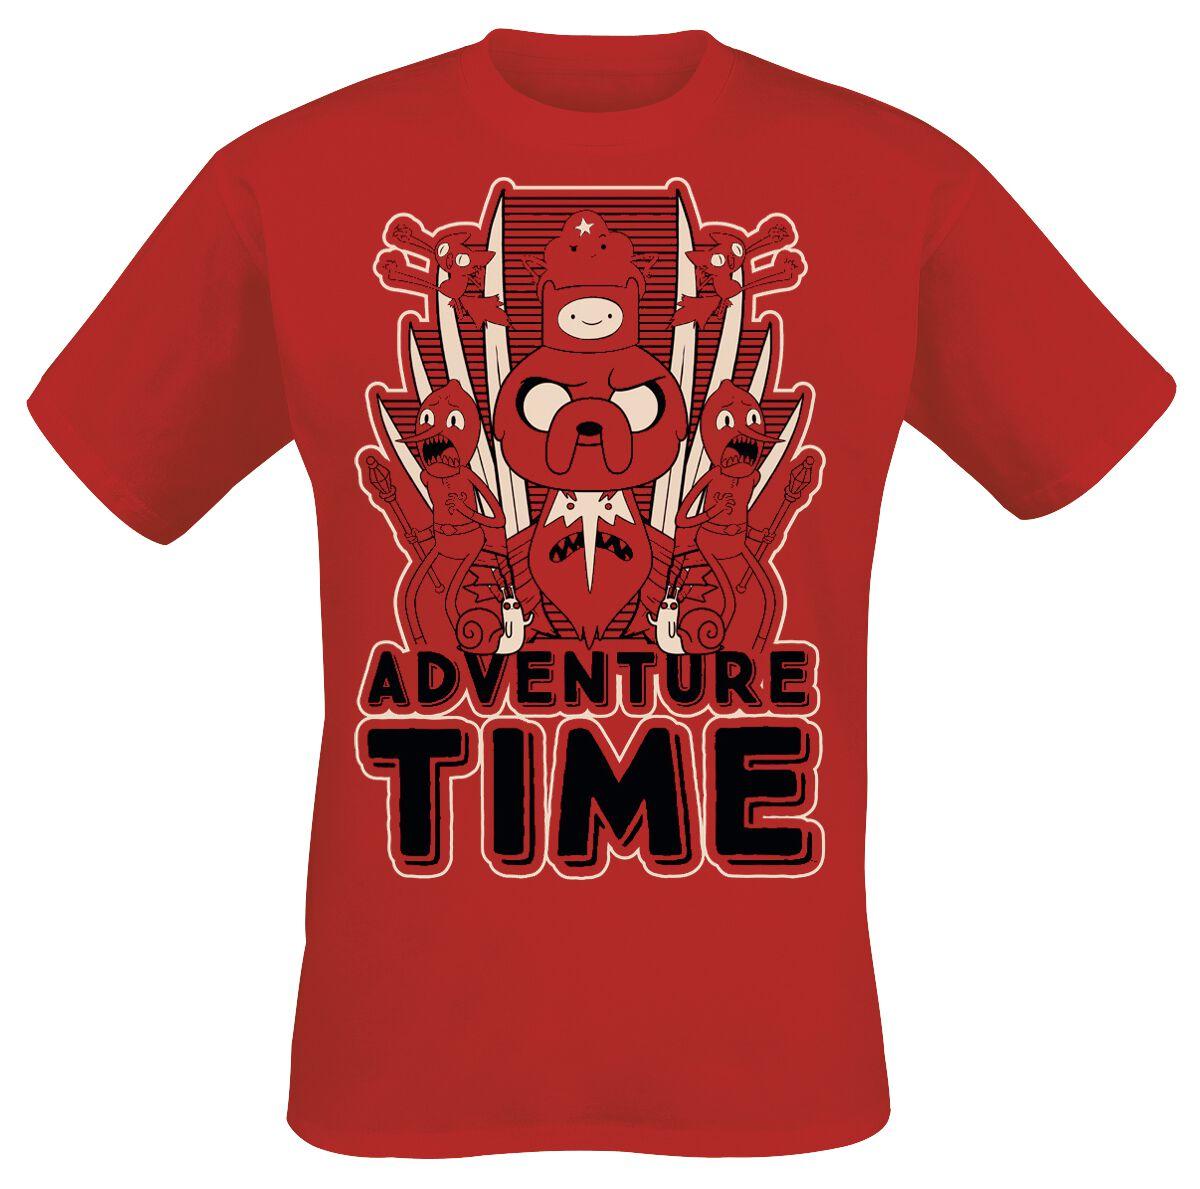 Mirror Image Adventure Time T Shirt Emp